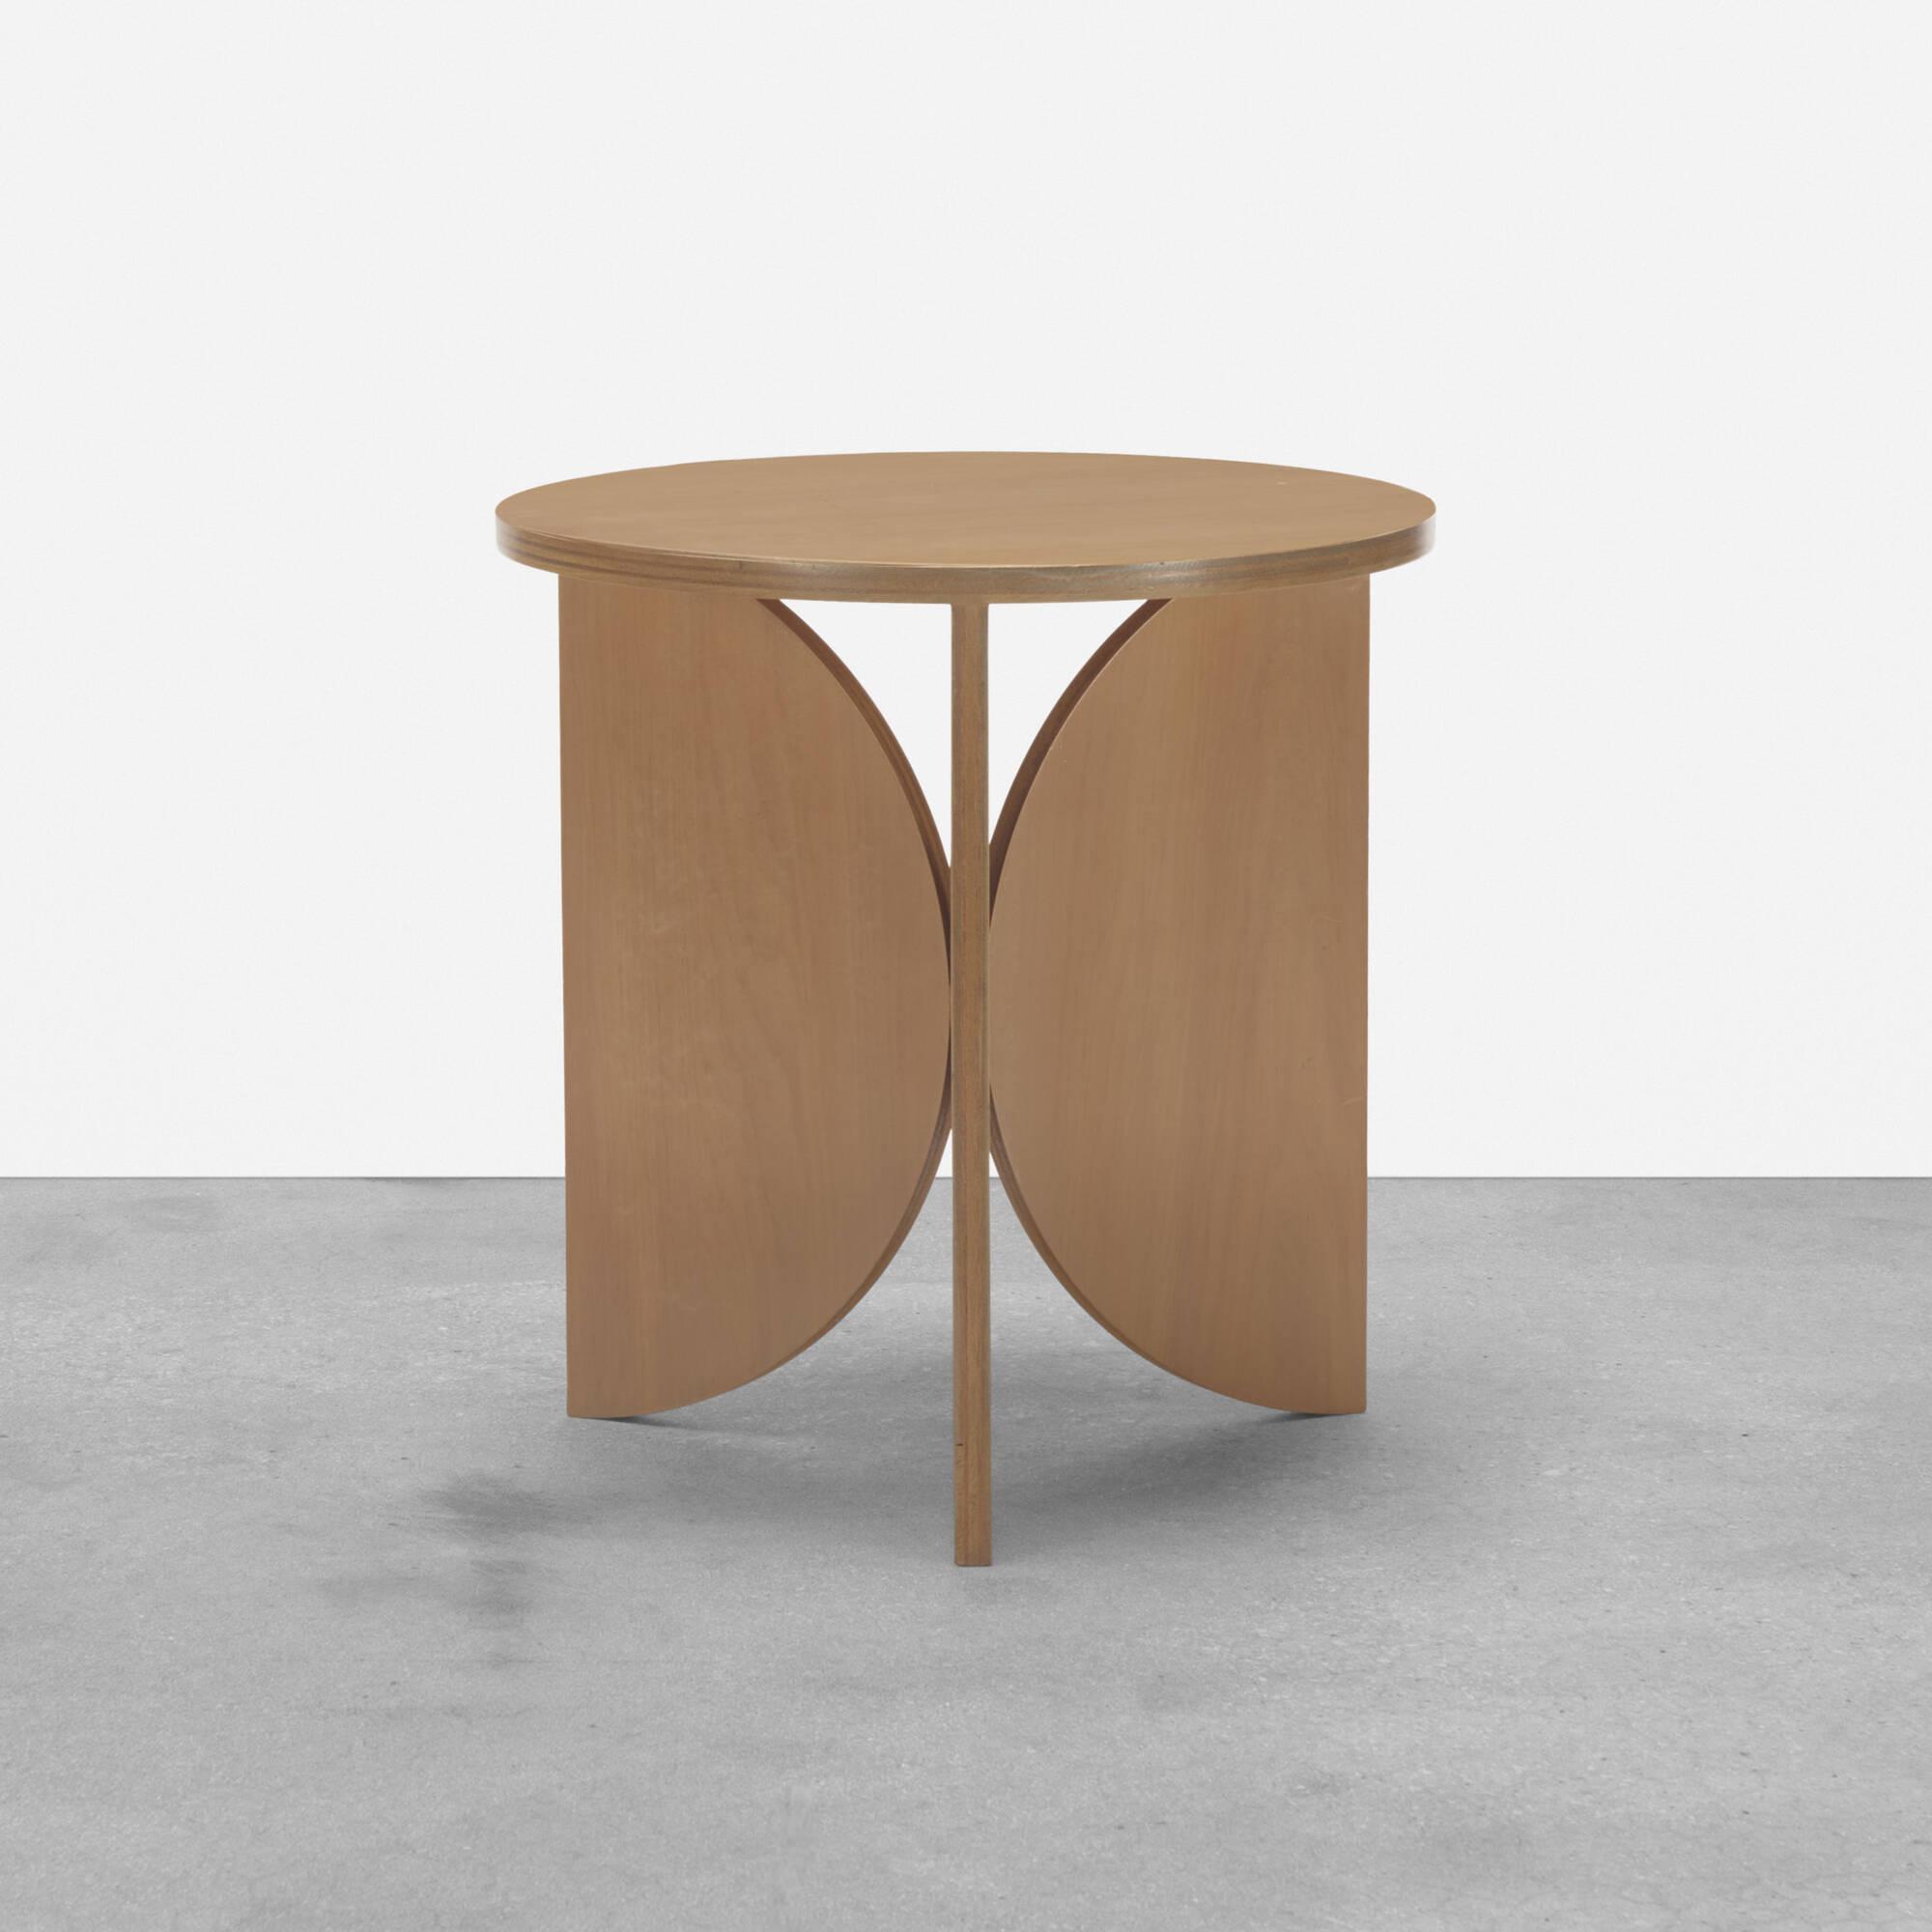 250: Scott Burton / Tripod table (1 of 3)